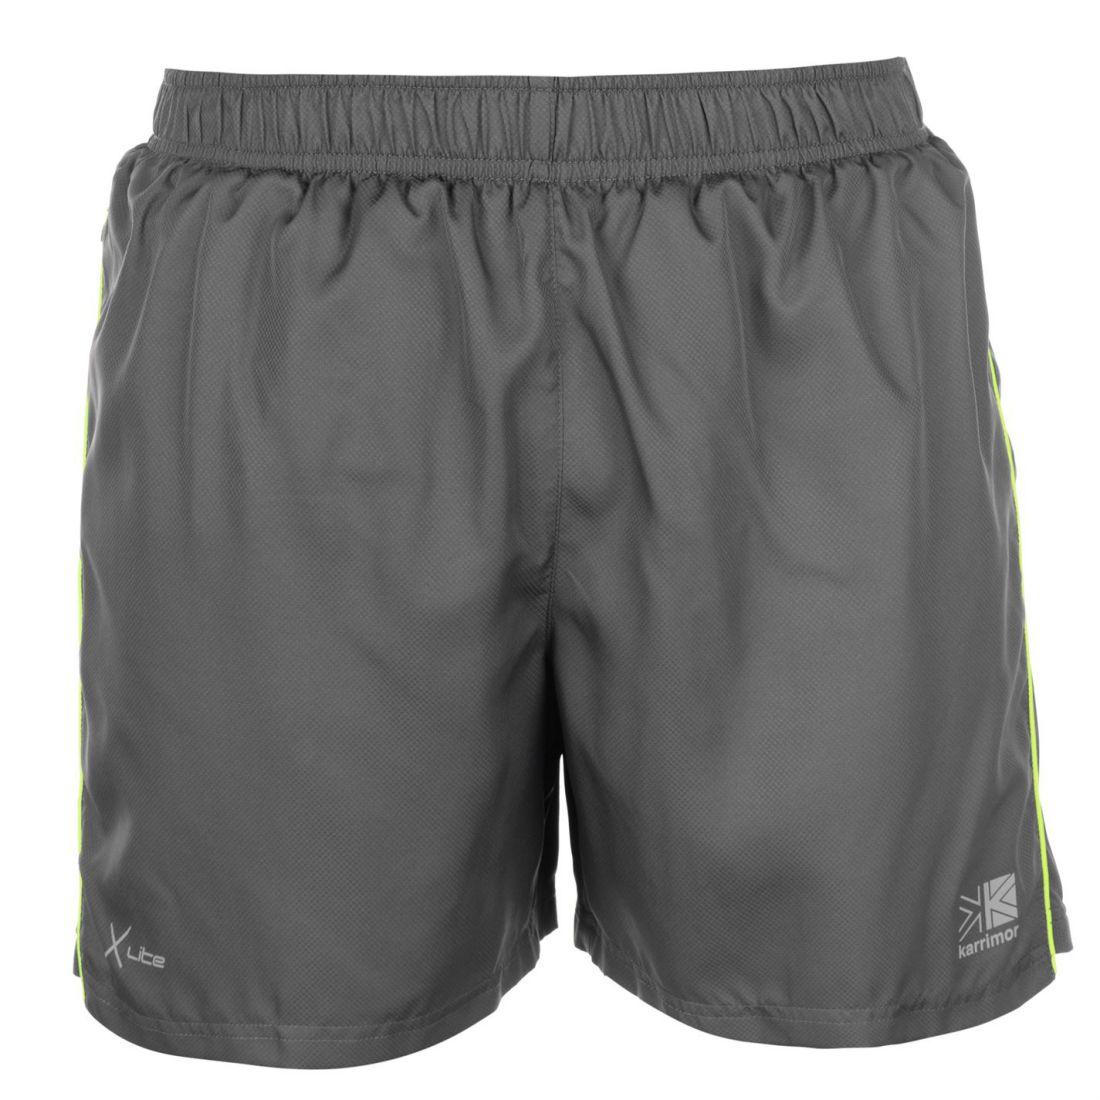 Karrimor-Xlite-5inch-Running-Shorts-Performance-Mens thumbnail 17